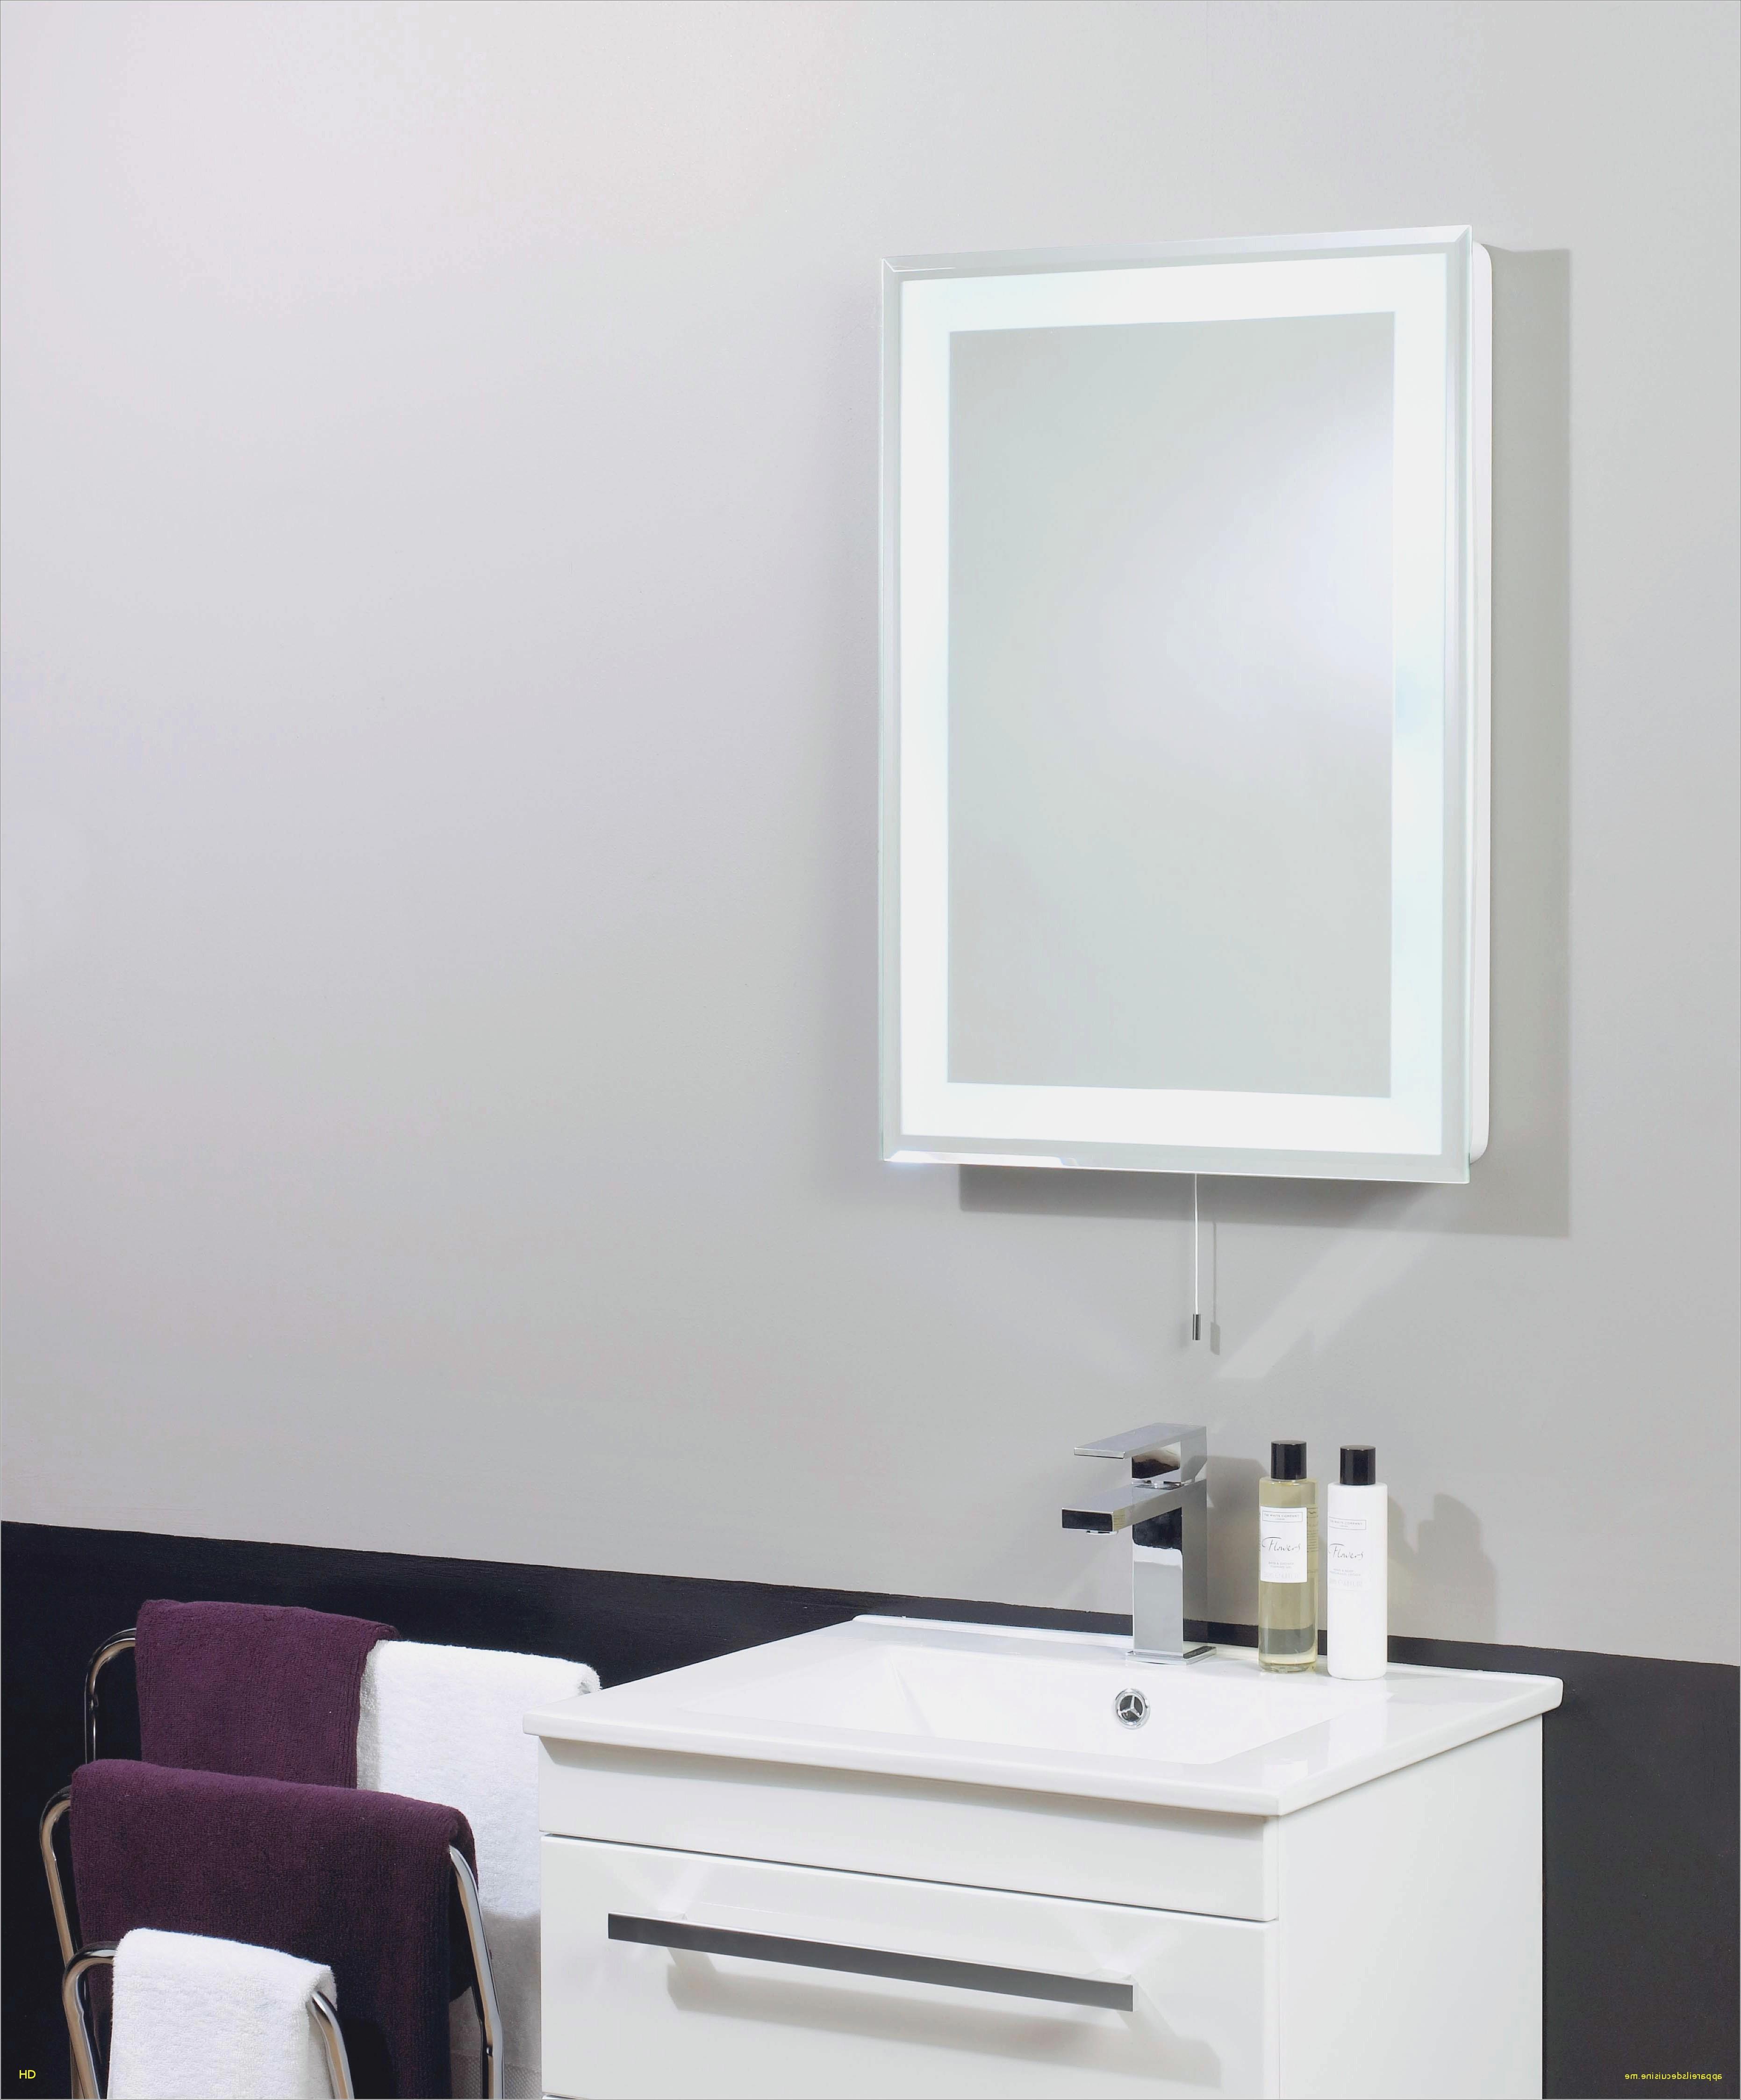 Salle De Bain Castorama Meuble Inspirant Photos Meuble Miroir Salle De Bain Castorama Miroir Salle De Bain Led